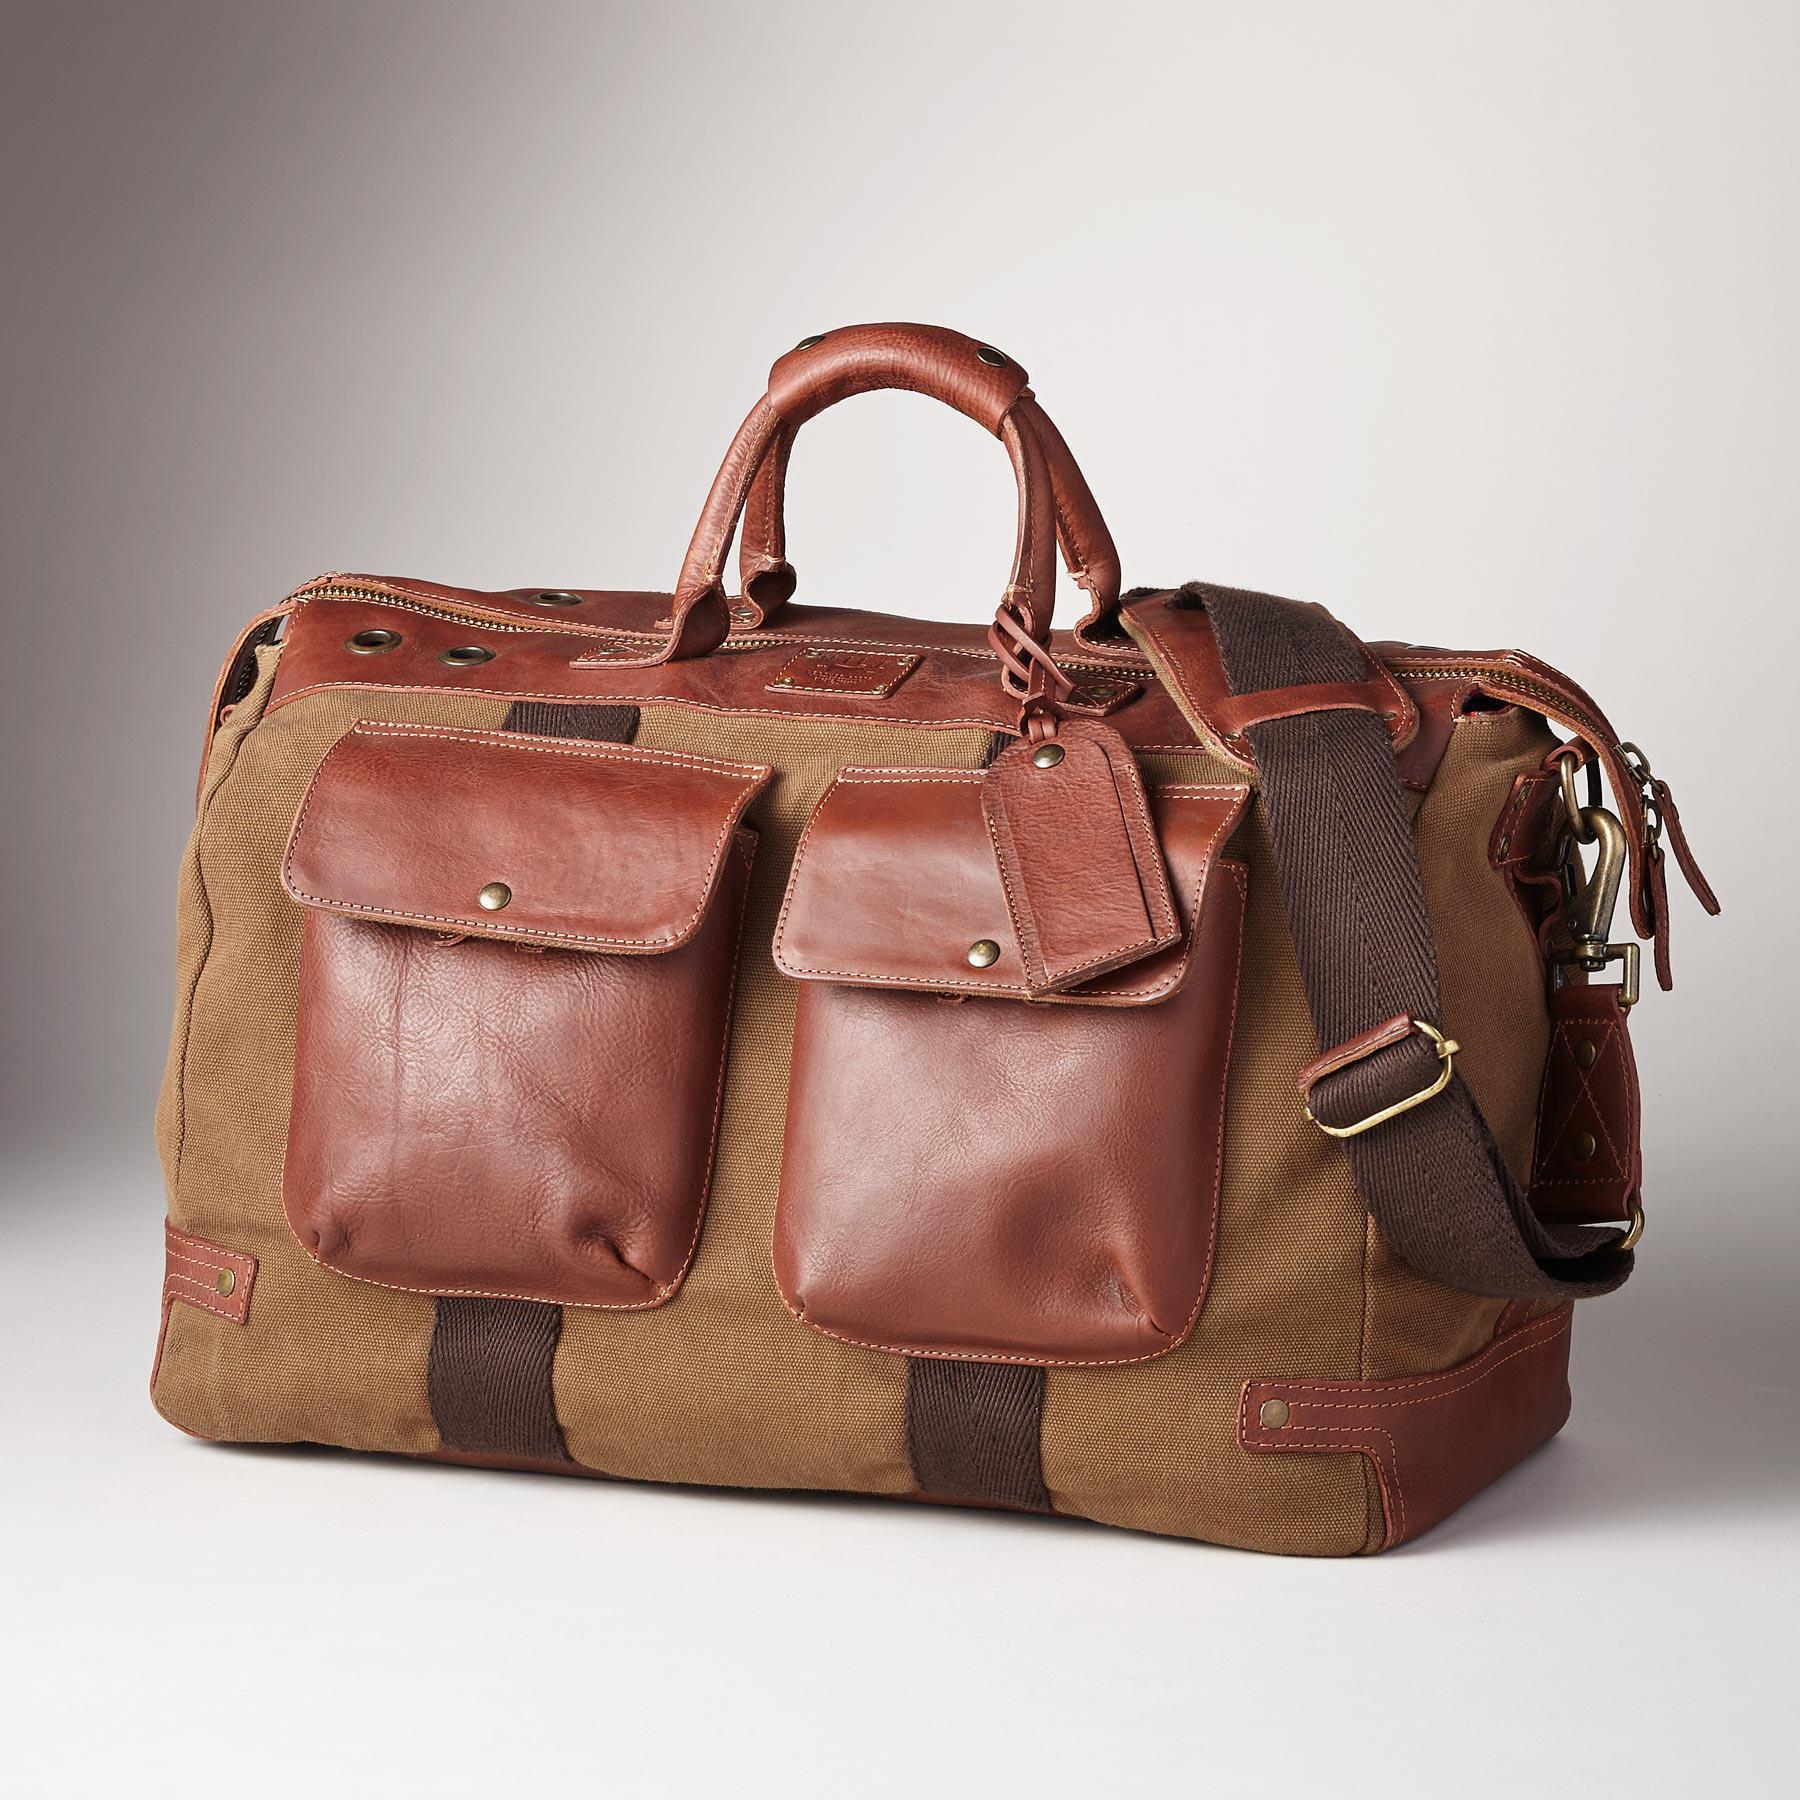 Venerations Duffle Bag: View 1